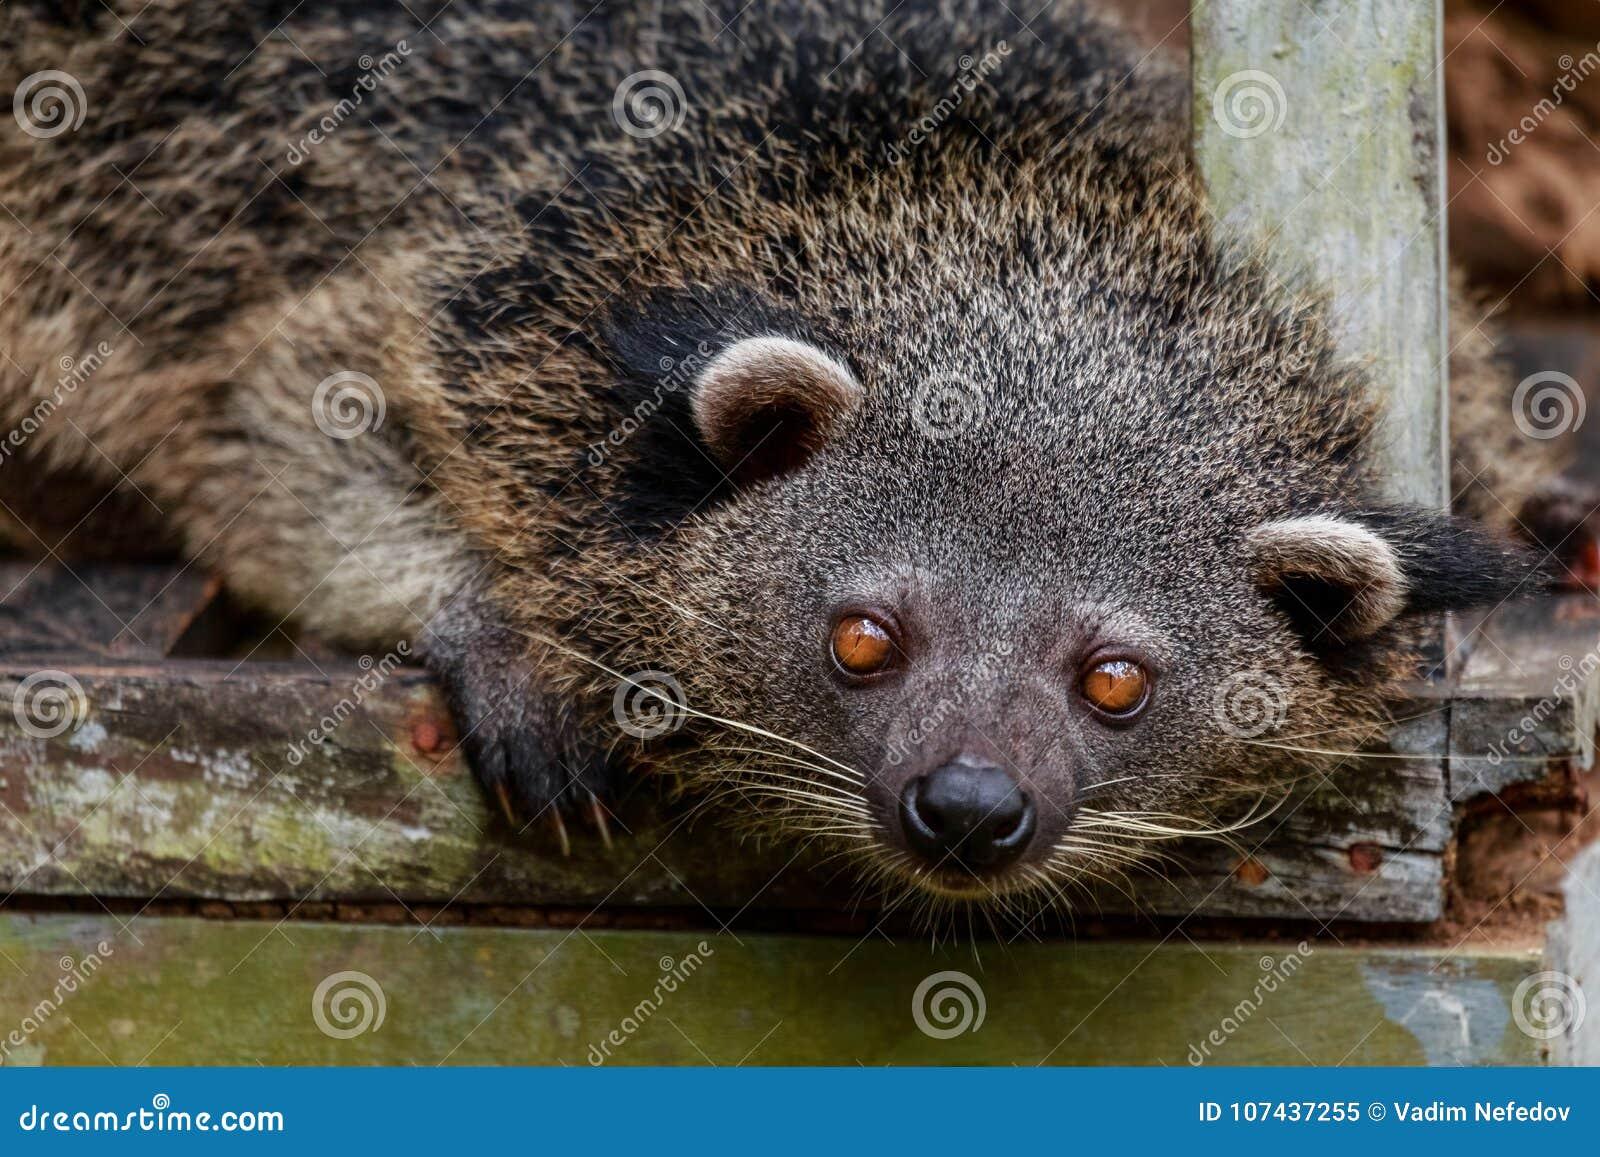 Binturong ή philipino bearcat που κοιτάζει περίεργα, Palawan, Phili